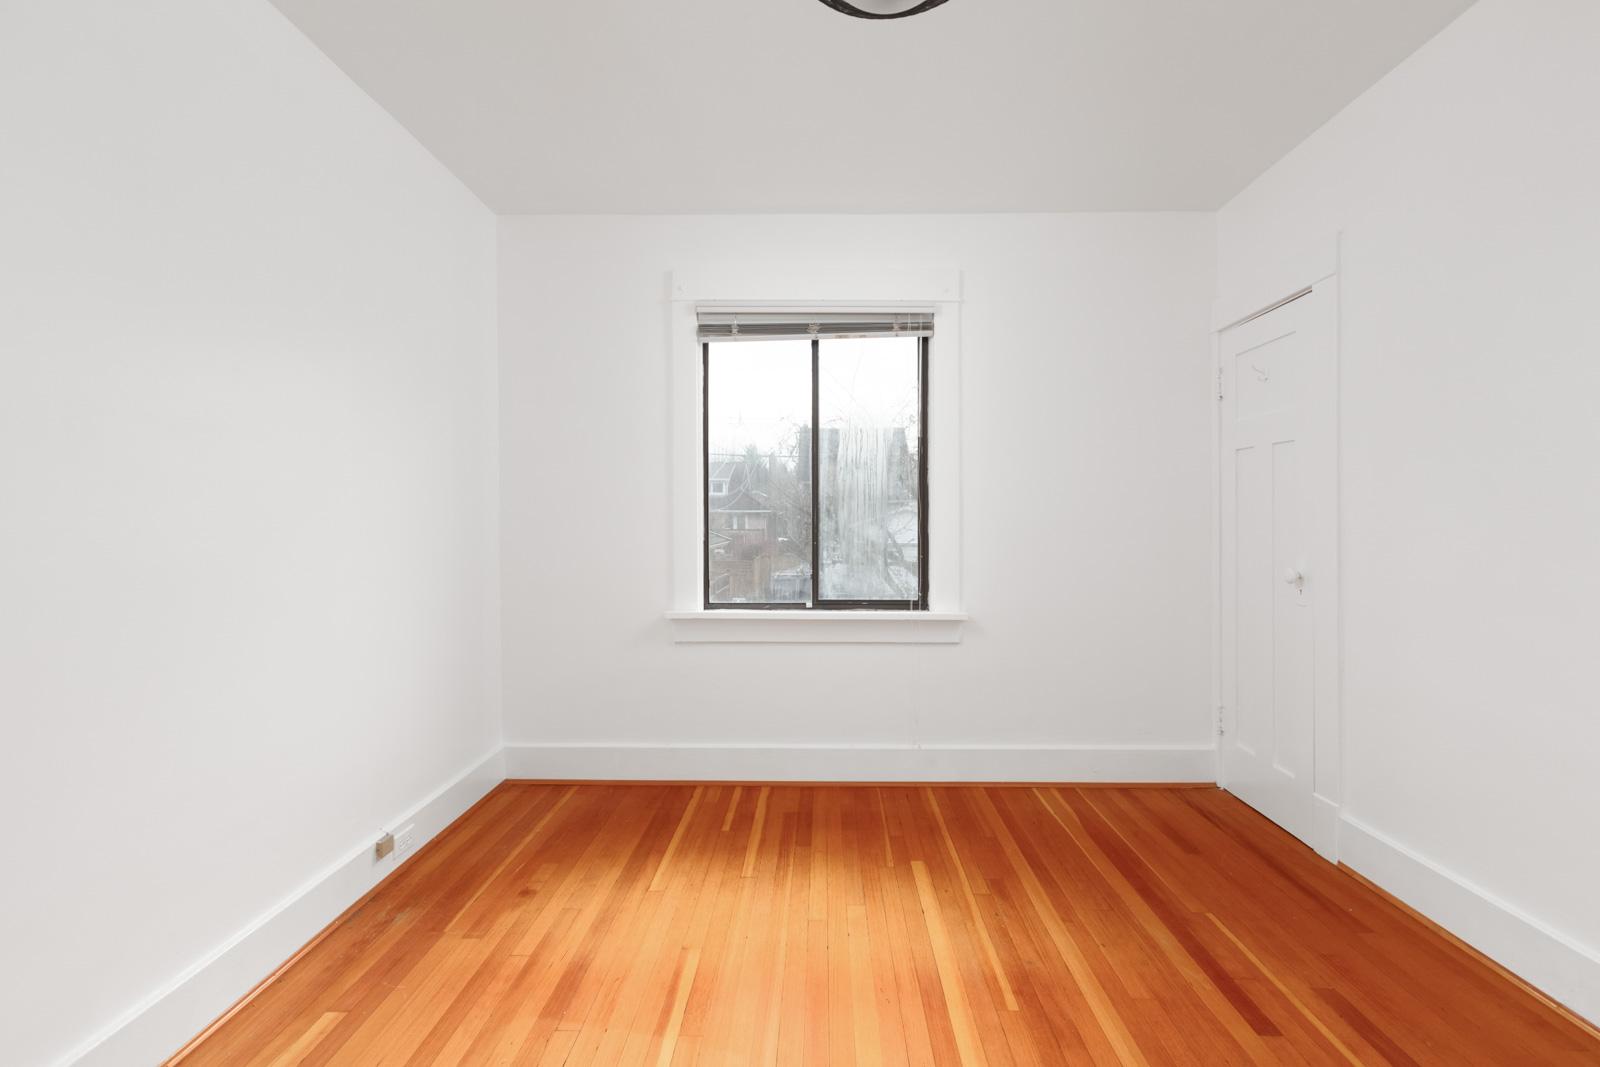 Empty bedroom with hardwood floor and plain window in centre of photo